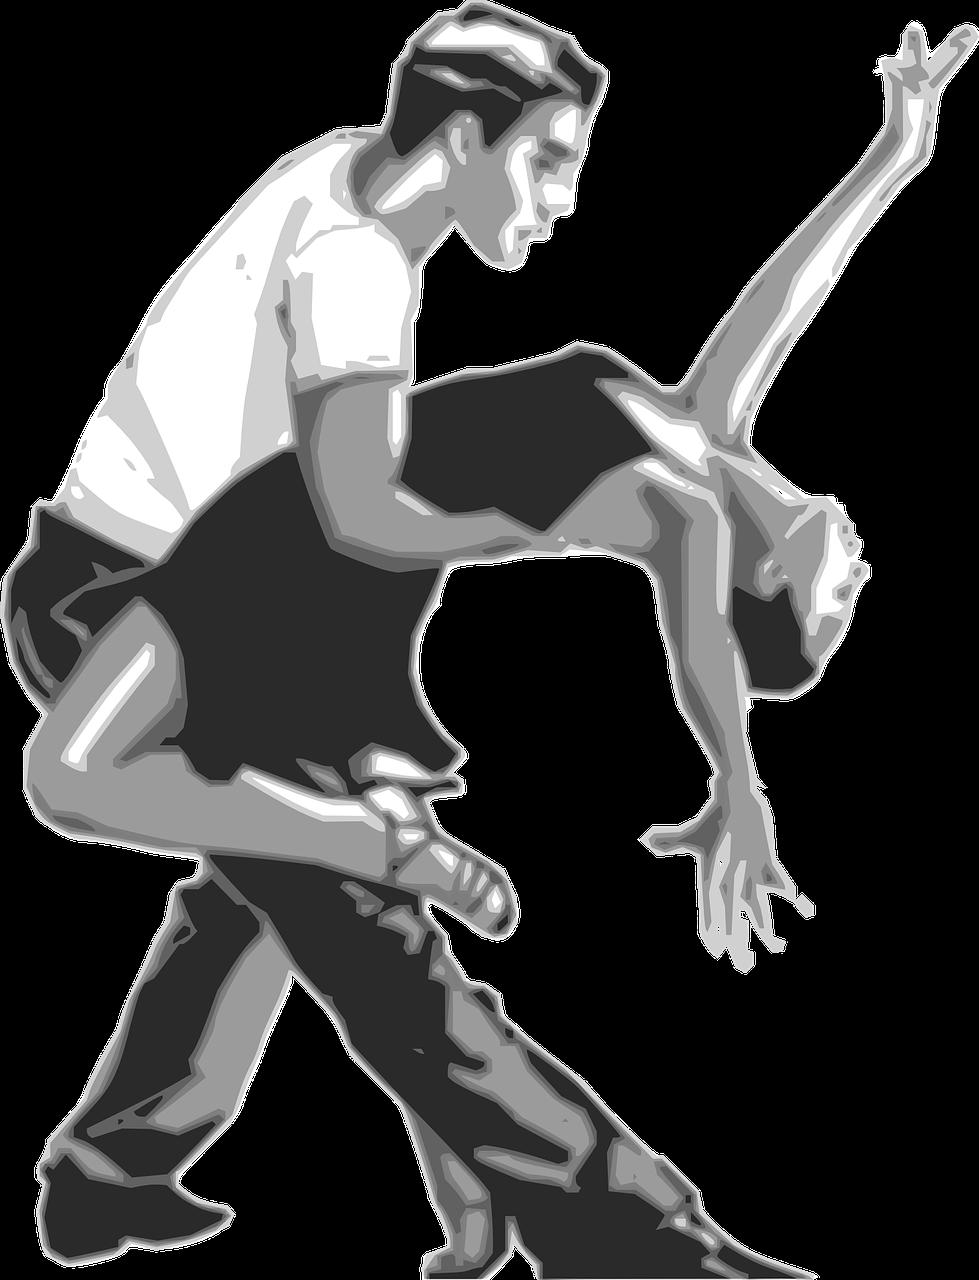 dancers-33395_1280